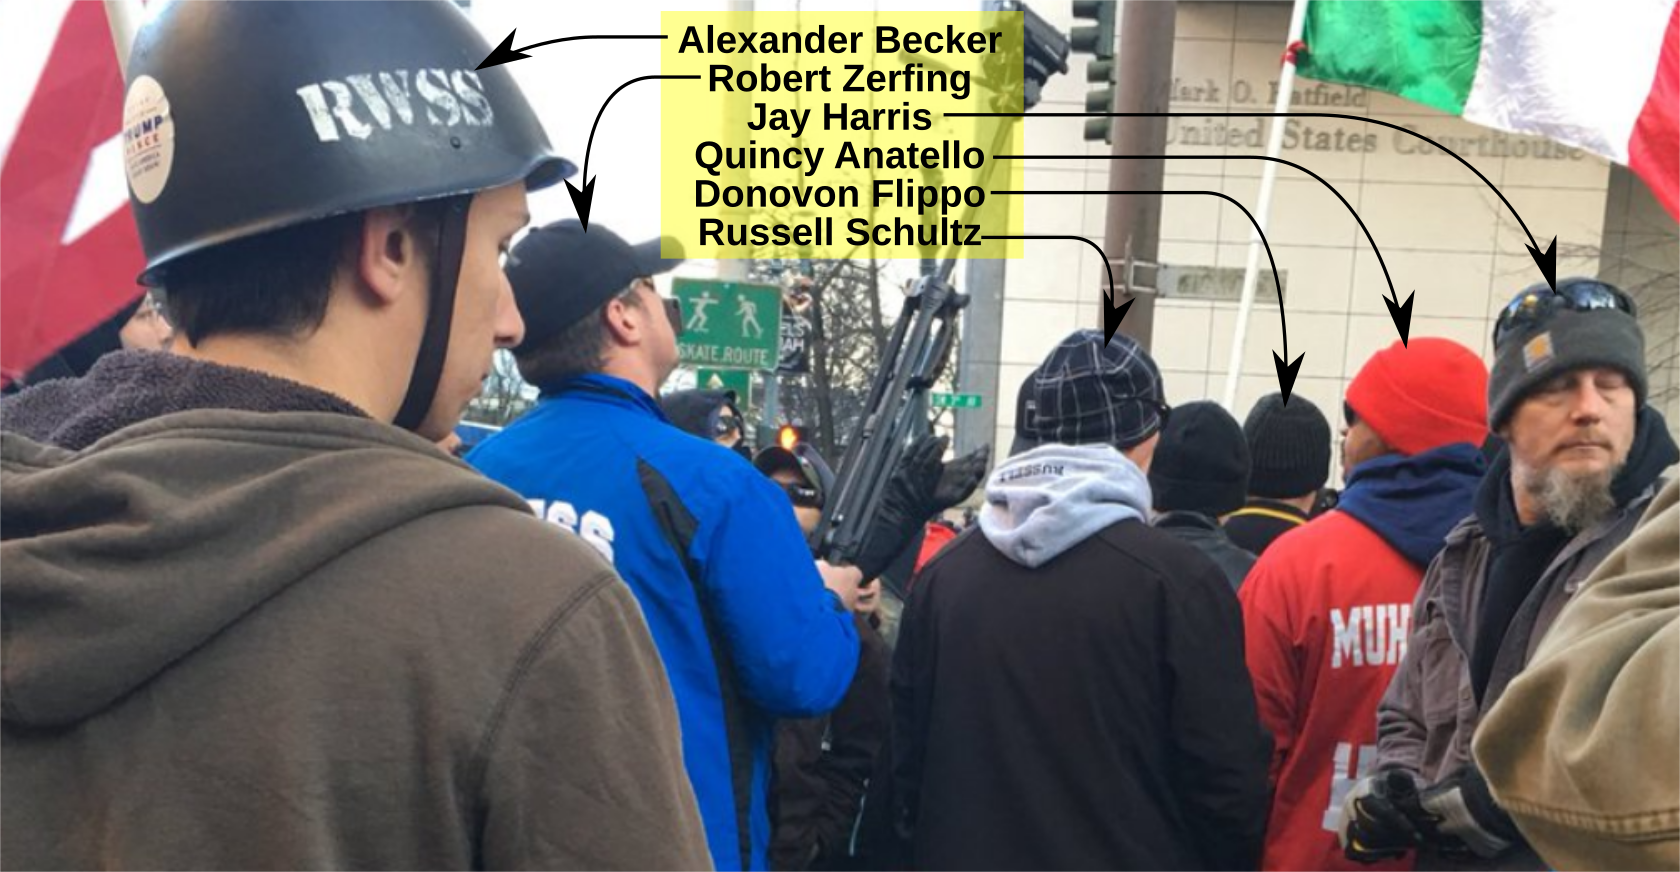 Quincy Anatello with neo-Nazi Alex Becker